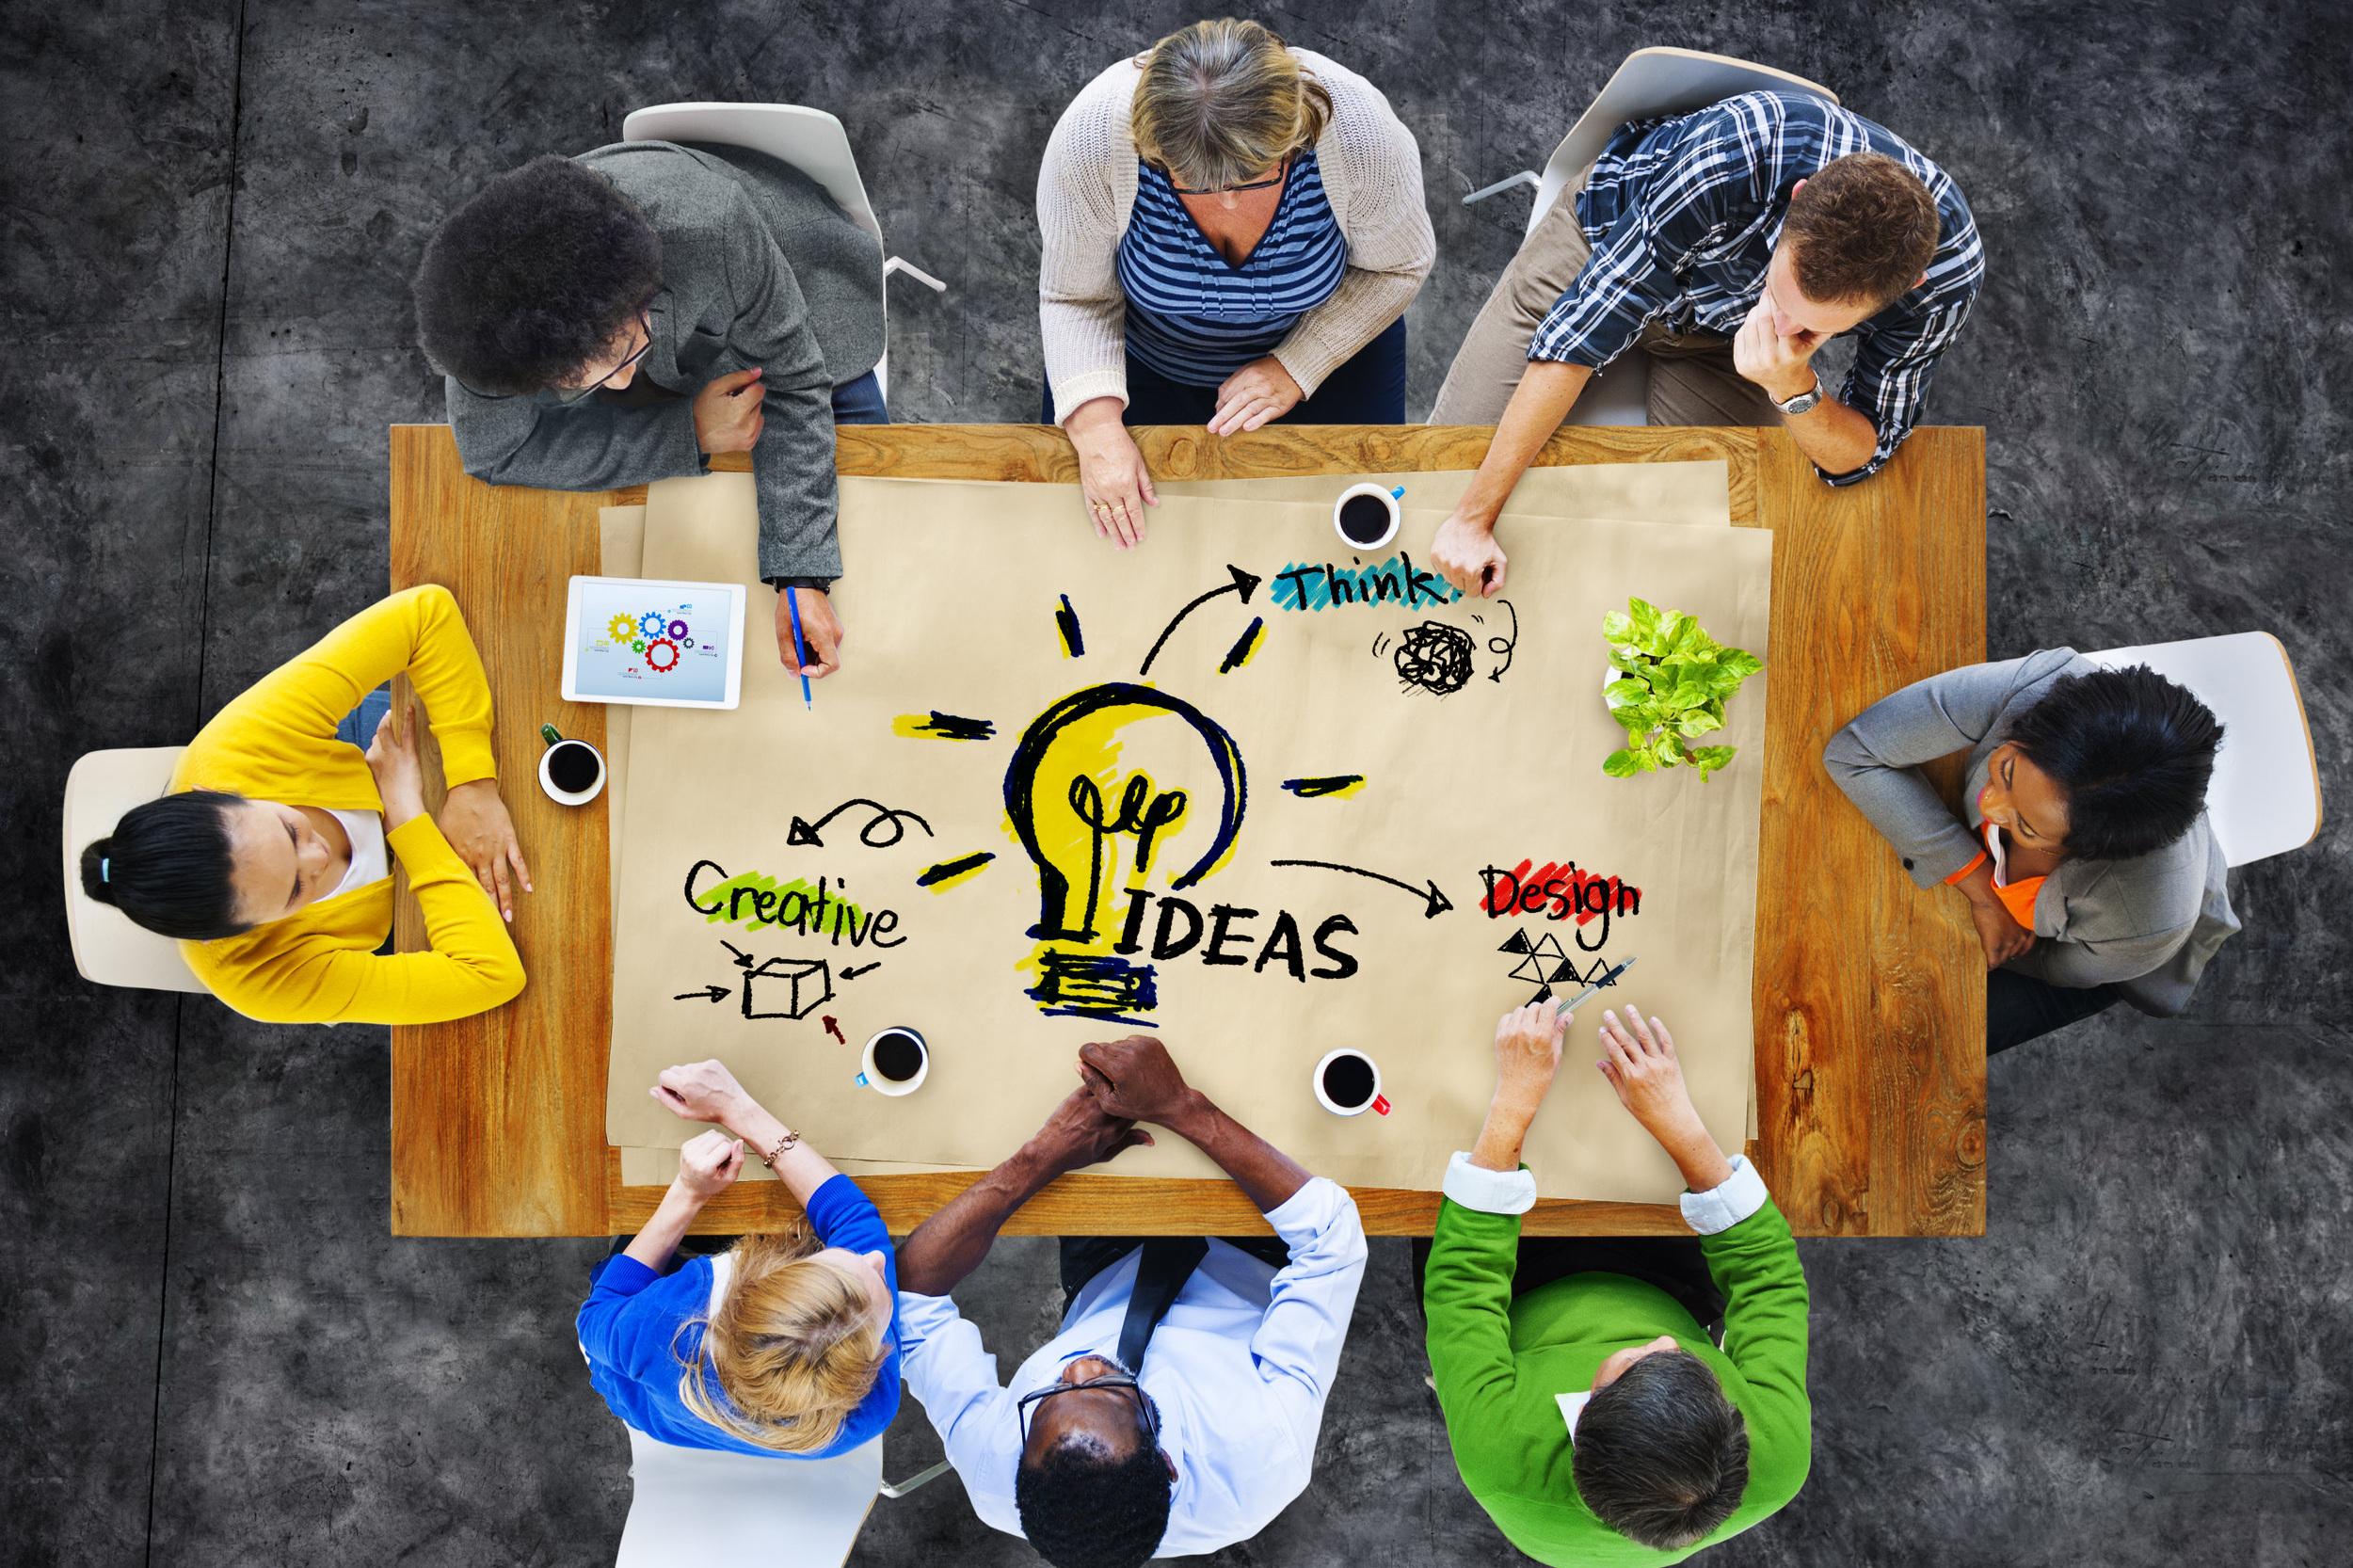 Creative+Leadership+Example.jpg